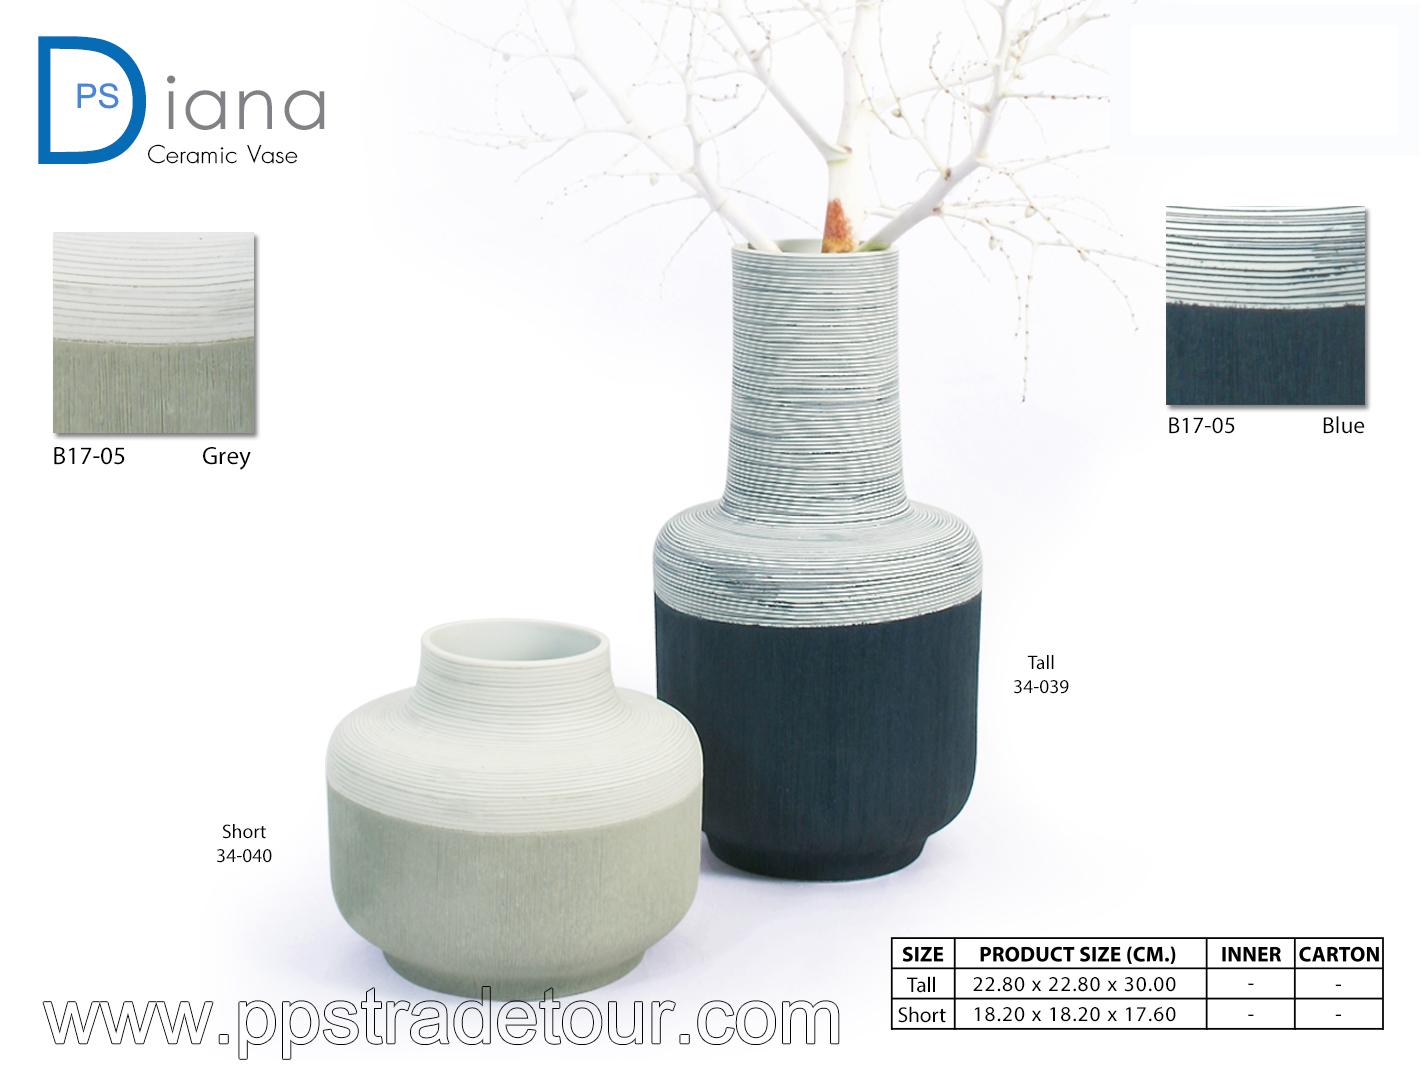 PSCV-Diana-B17-05-Blue-grey